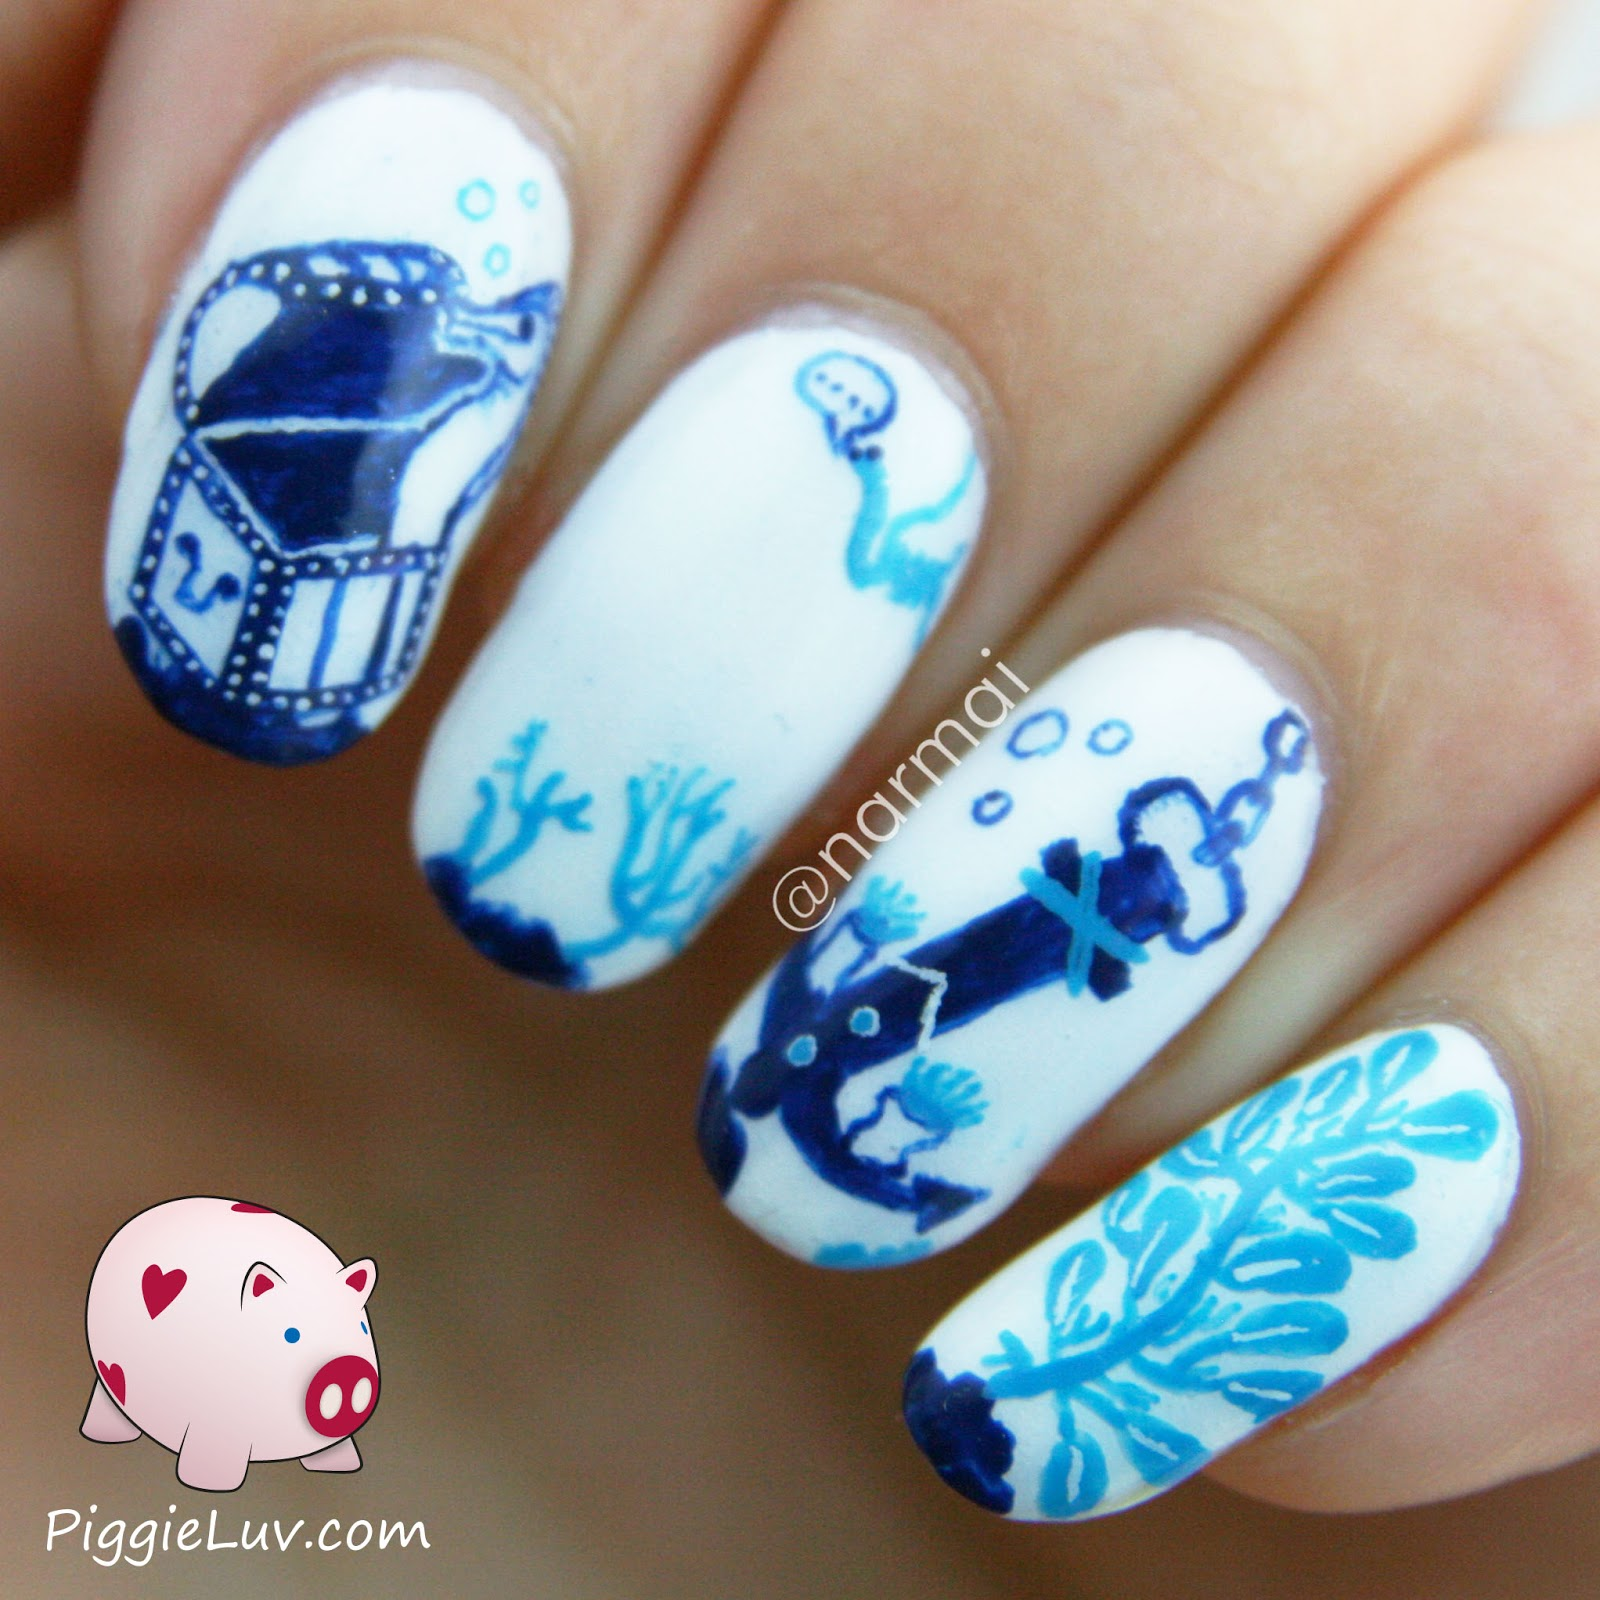 PiggieLuv: Deep blue sea nail art (glow in the dark!)